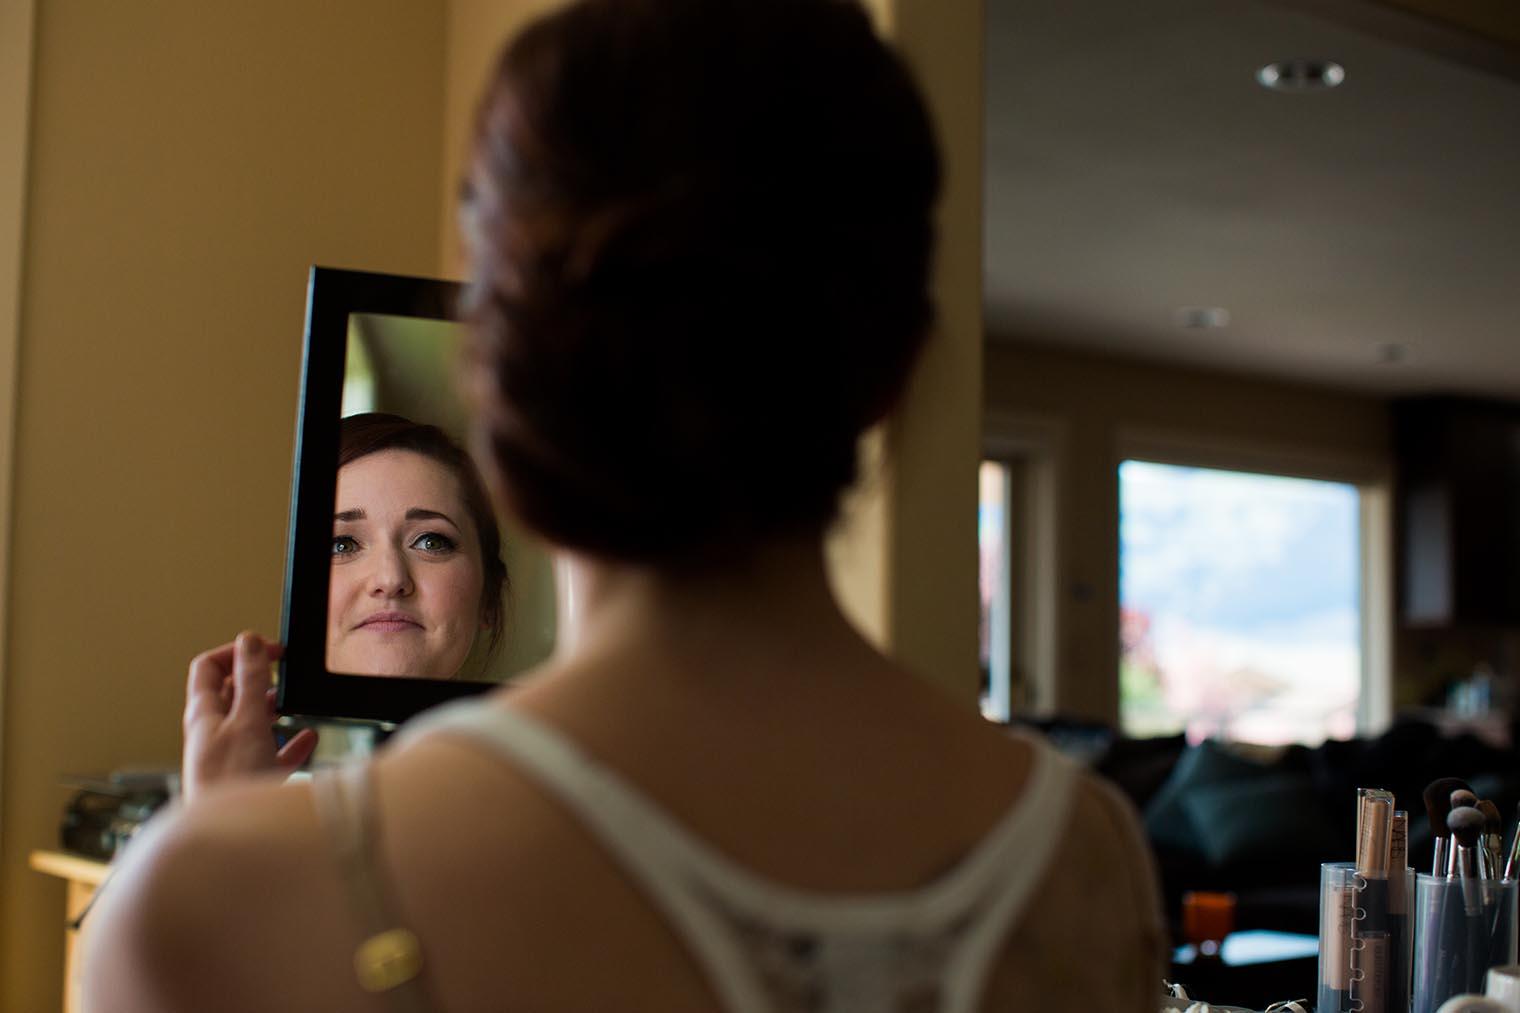 Wedding Photographer located in Wenatchee, WA